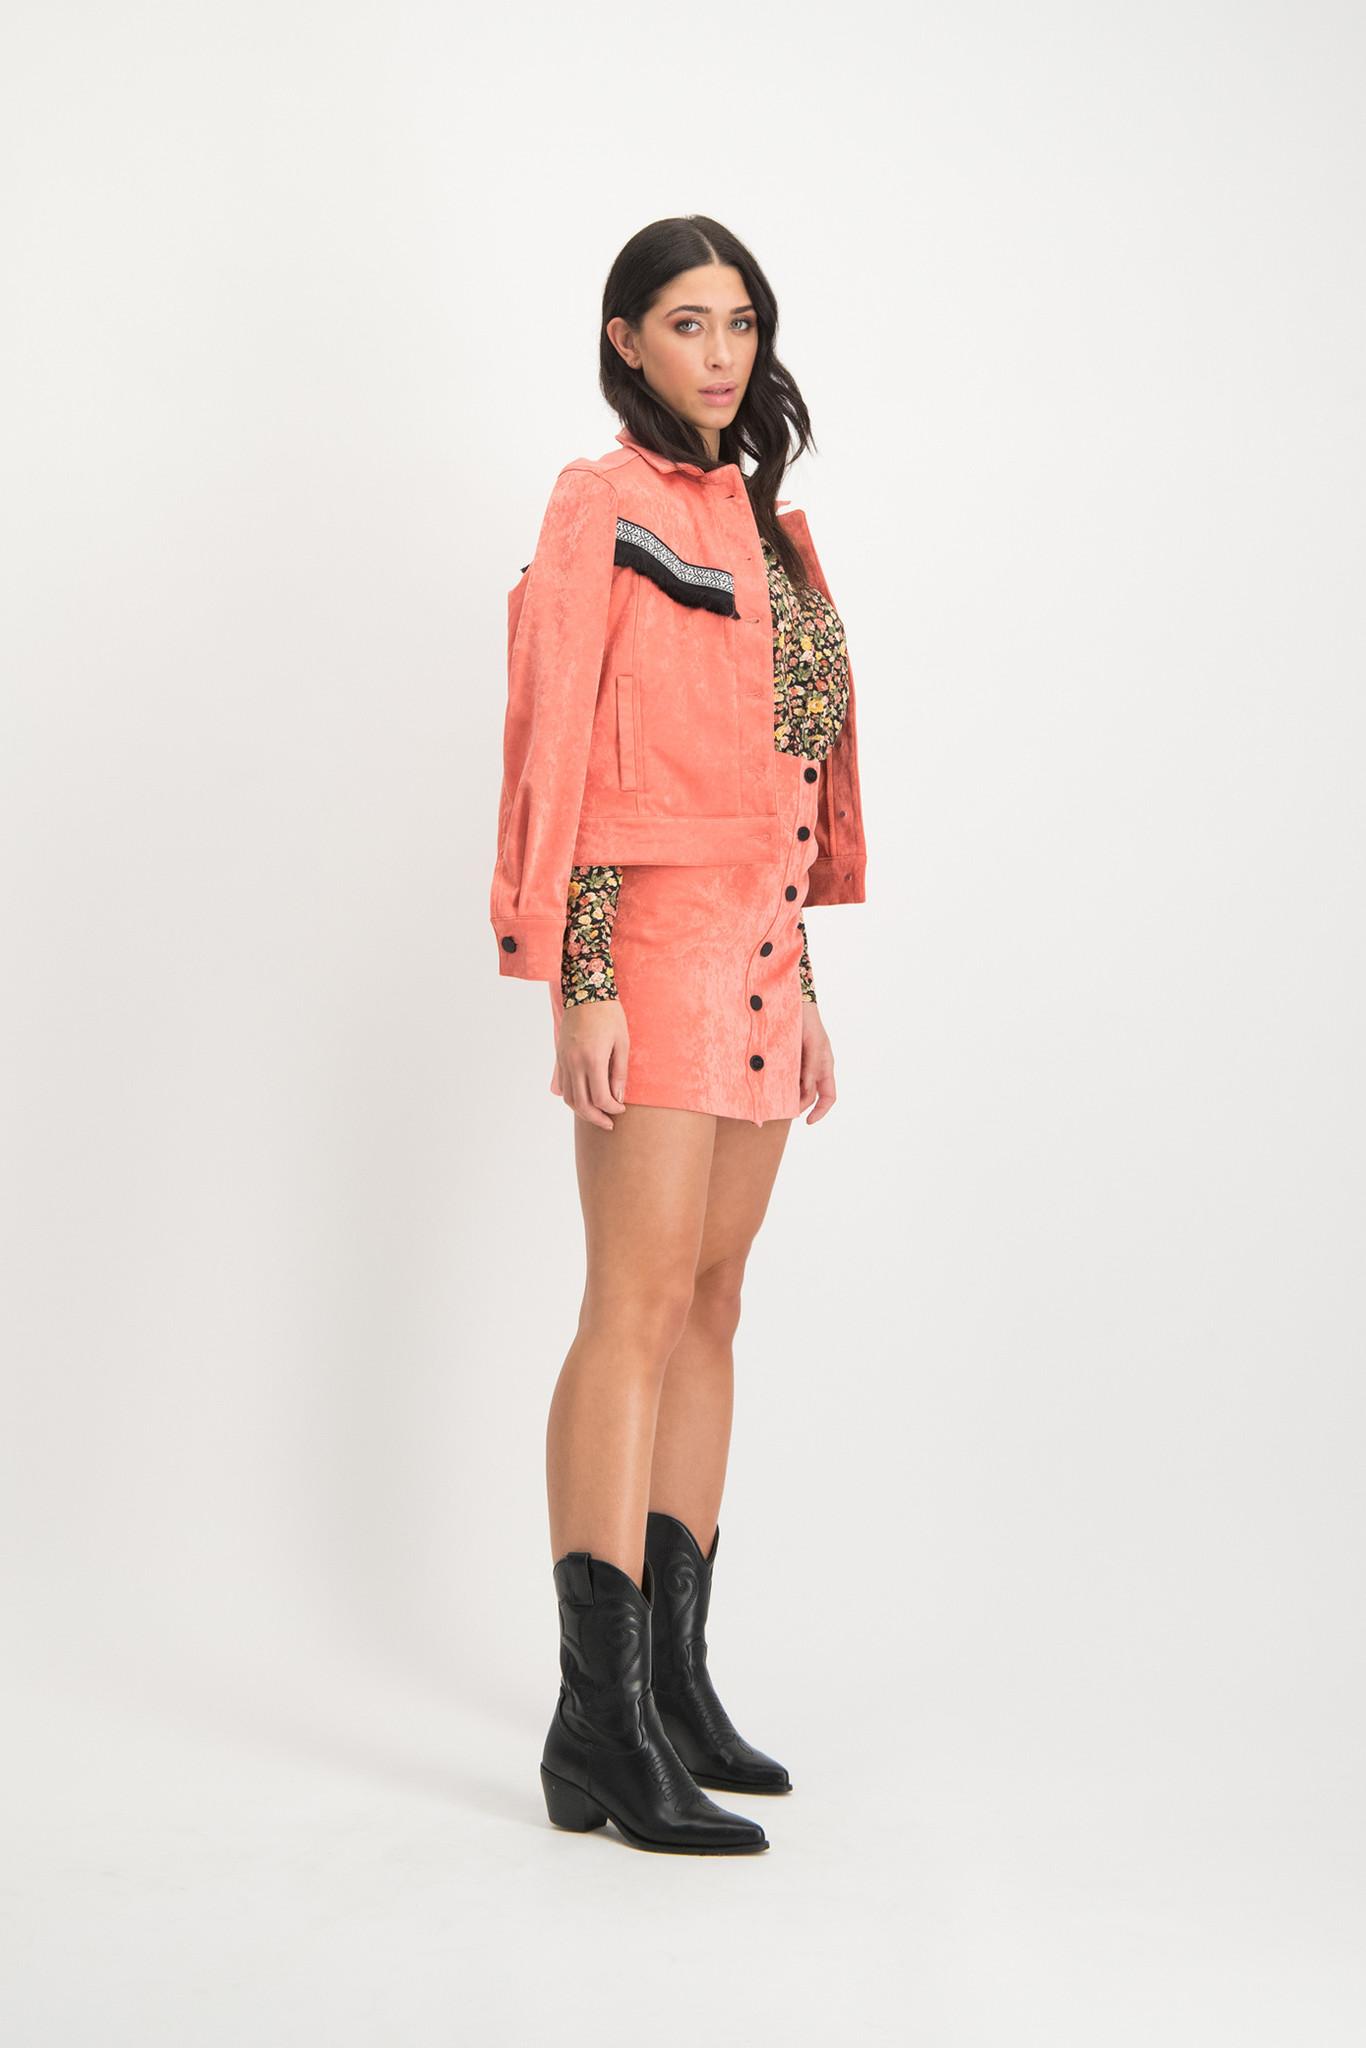 Lofty Manner Pink Jacket Gini